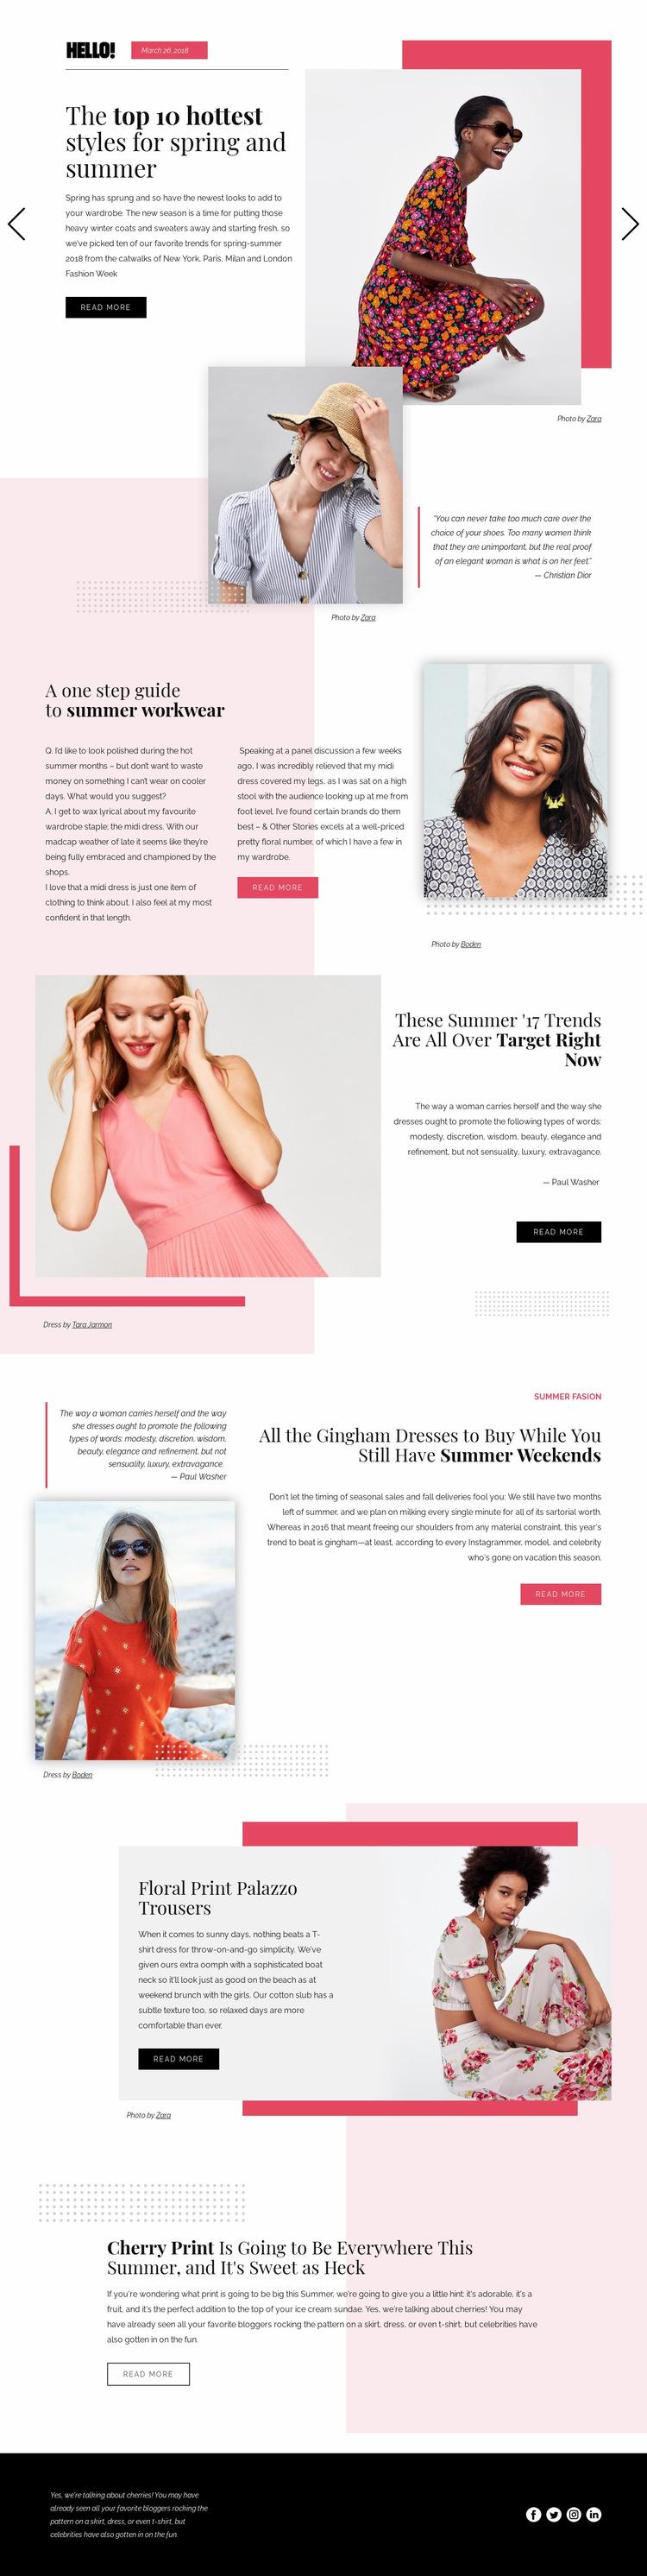 Fashion Trends Web Page Design